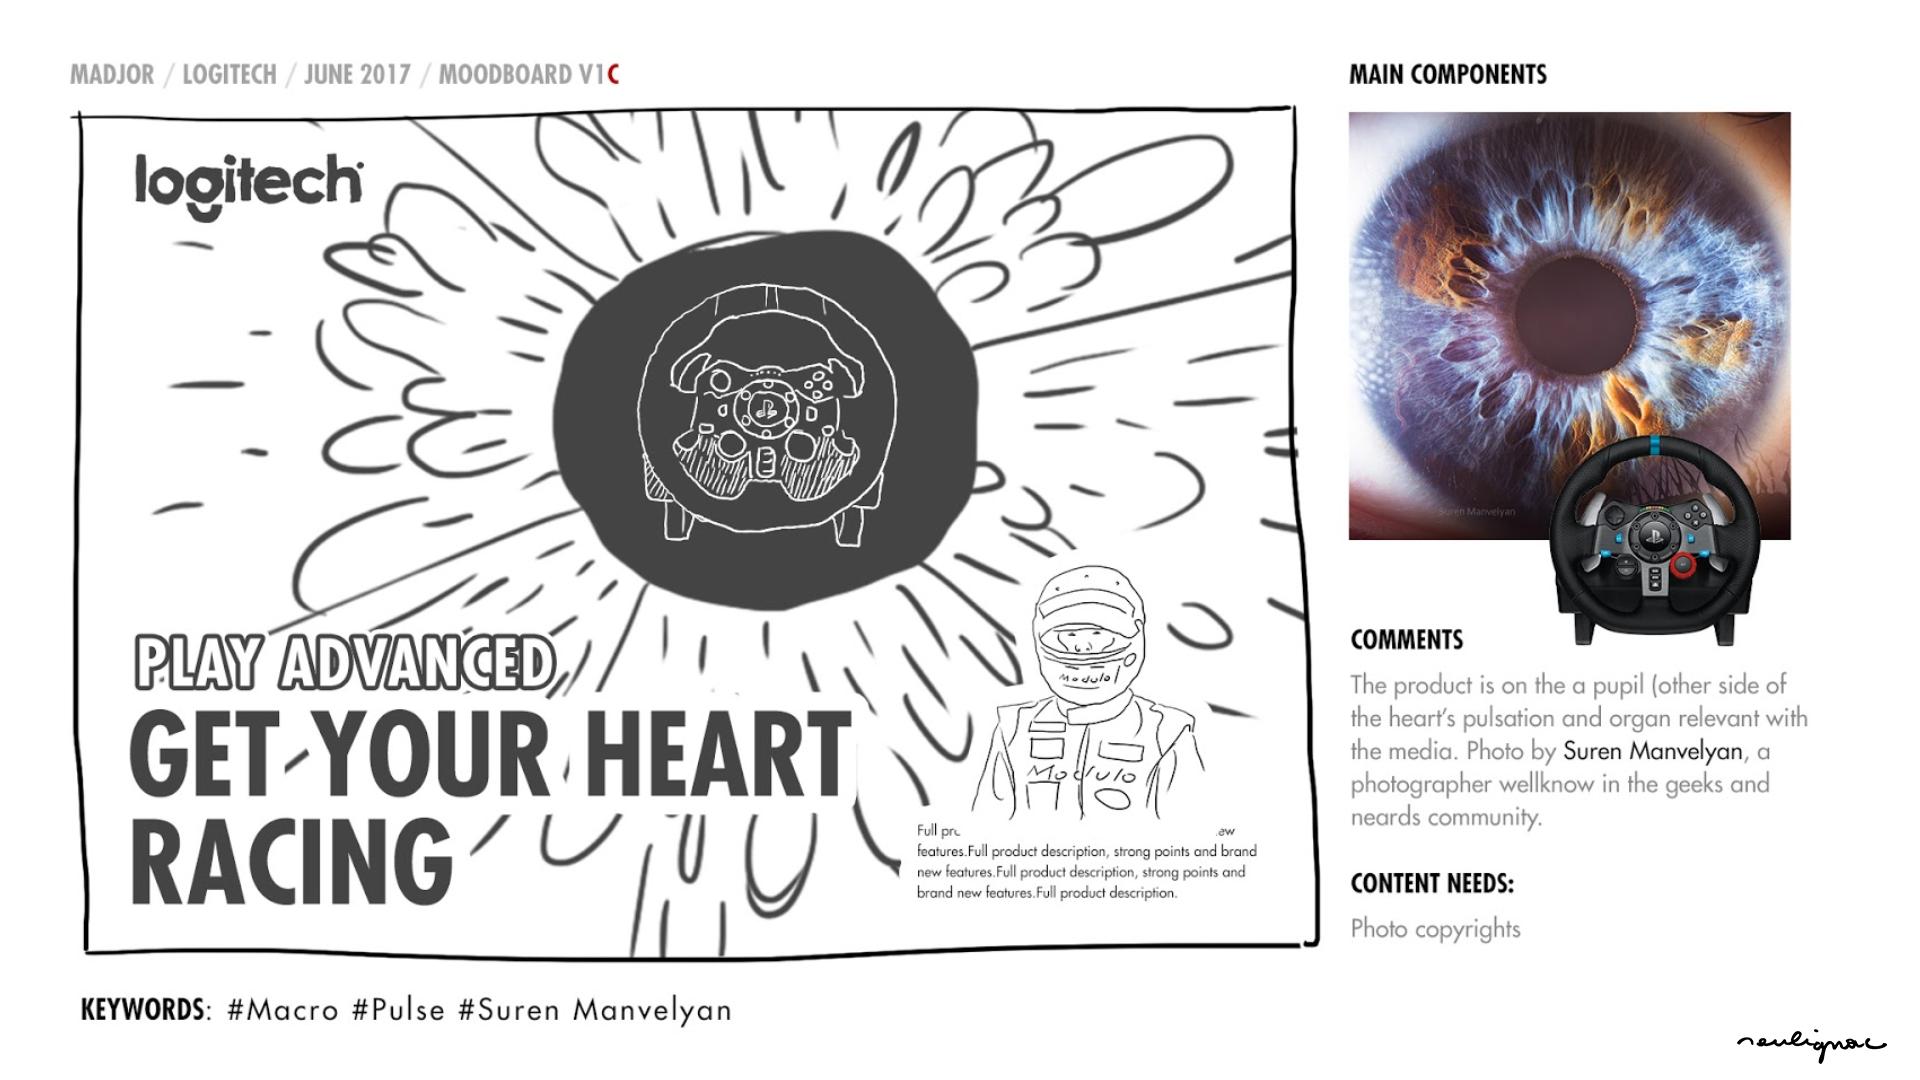 Logitech China - Global Campaign Keiichi Tsuchiya - GET YOUR HEART RACING - KEY VISUAL RESEARCHES & MOODBOARD - Francois Soulignac - Digital Creative & Art Direction - MADJOR Labbrand Shanghai, China